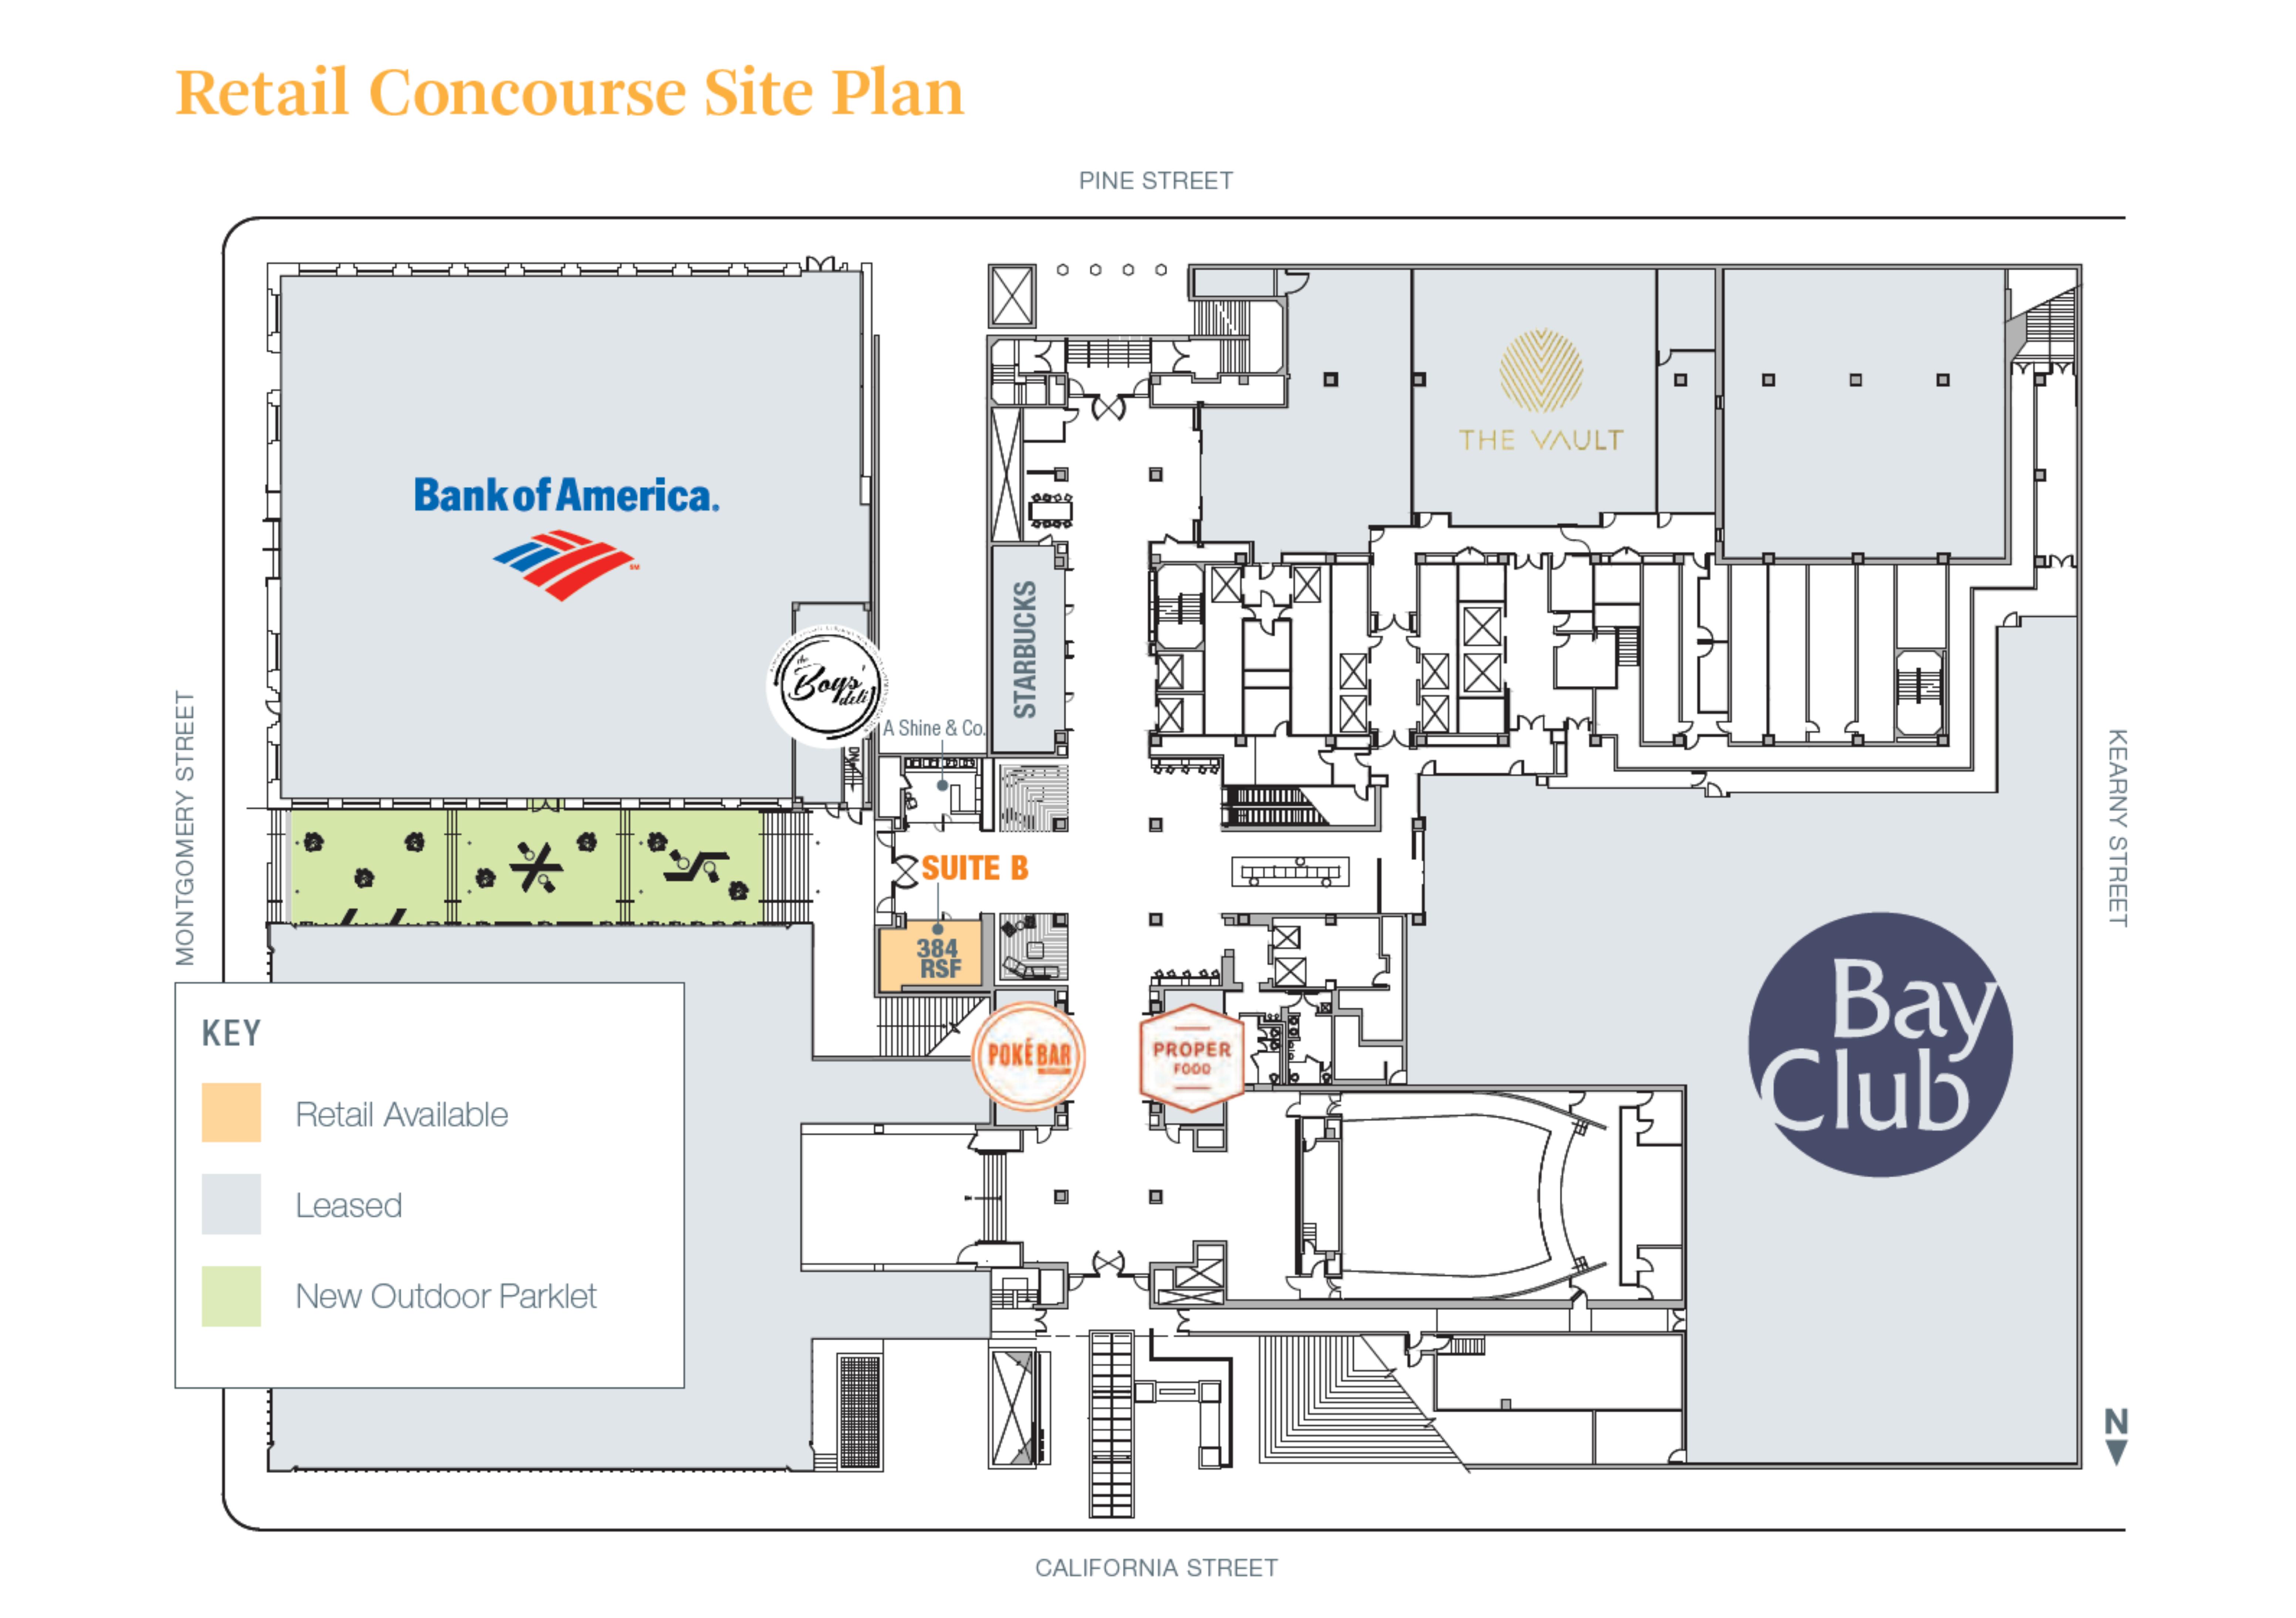 555 California Street: site plan